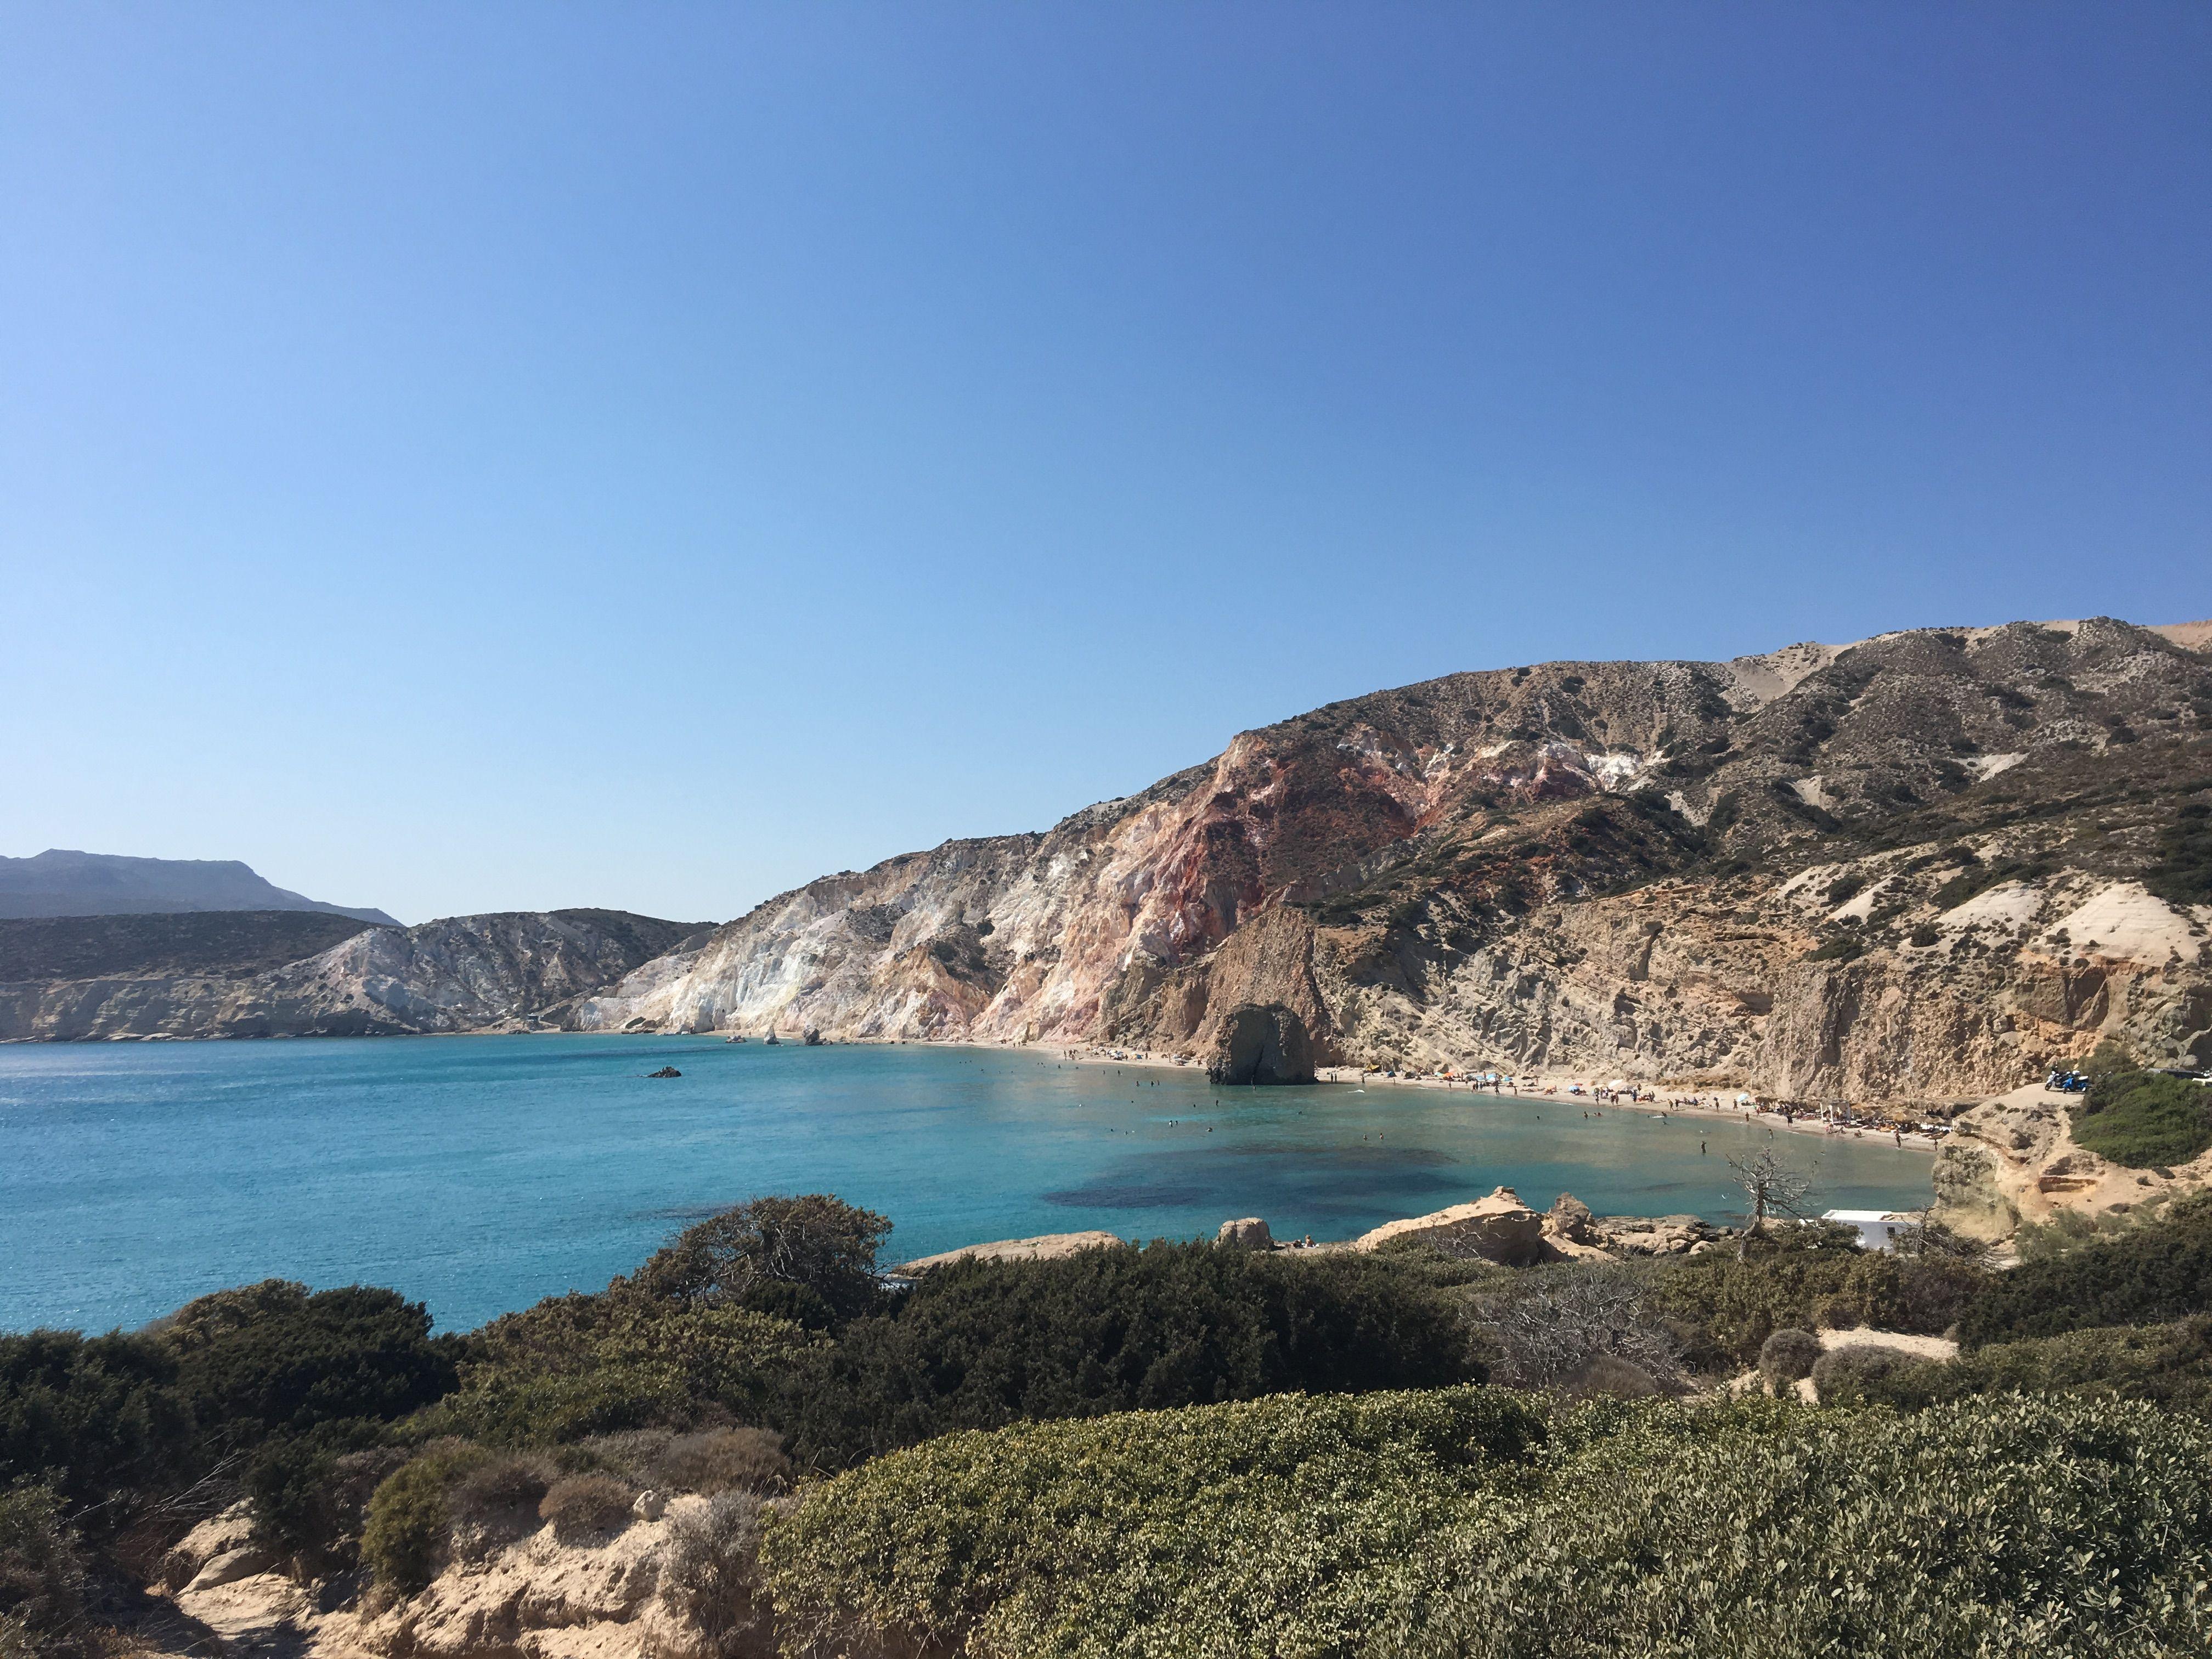 #greekislands #greektravel #bay #mountains